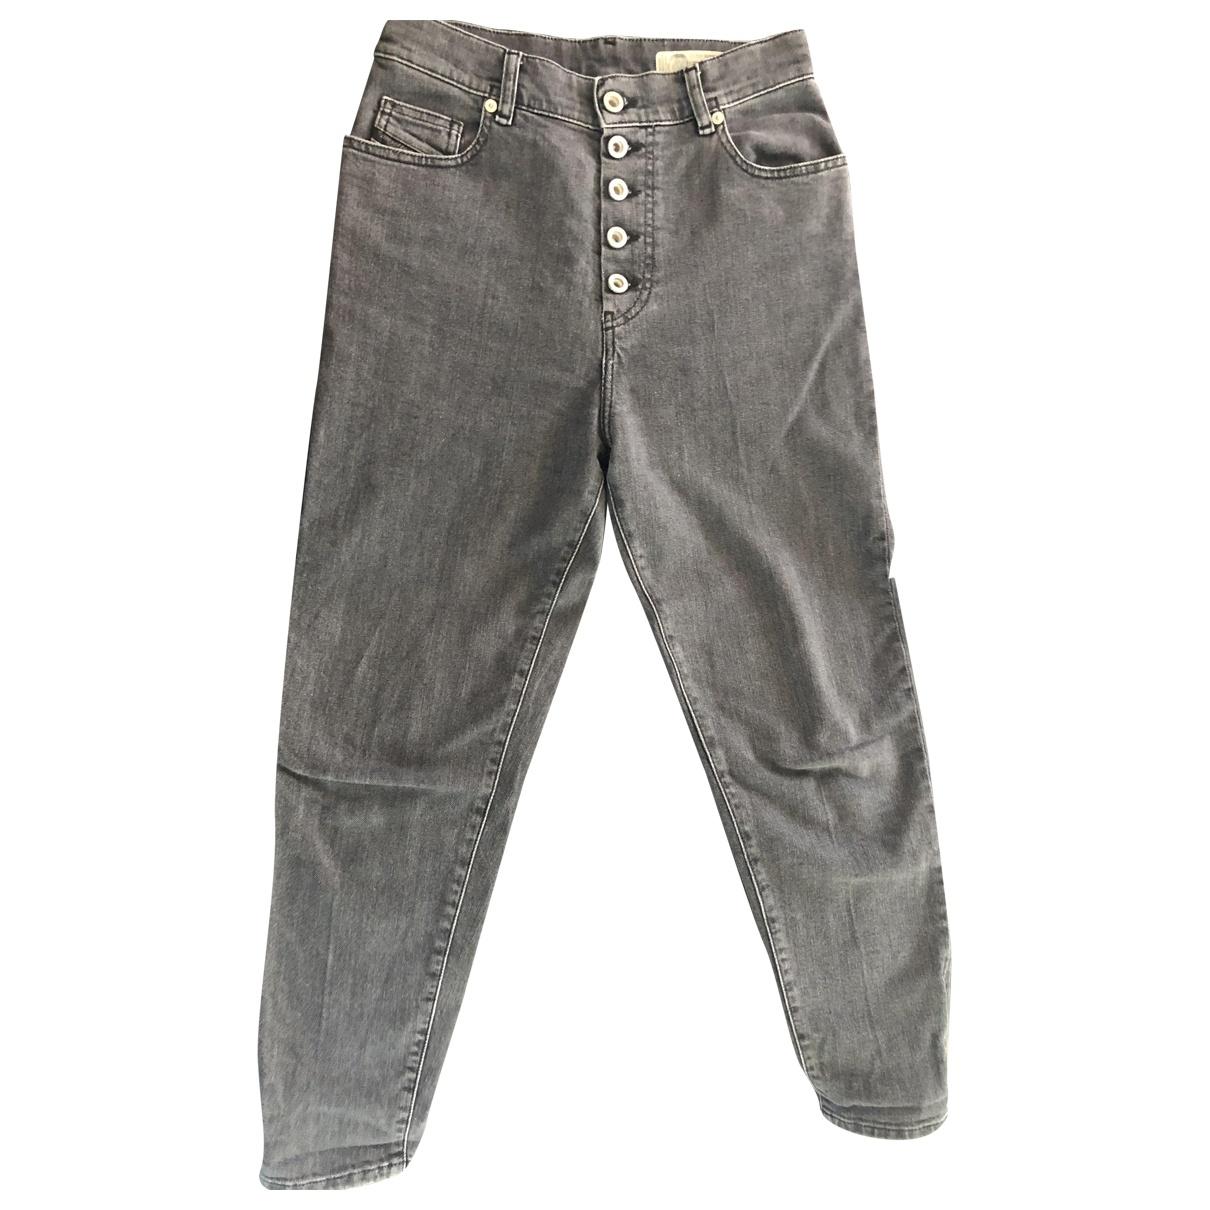 Diesel \N Grey Denim - Jeans Jeans for Women 34 FR